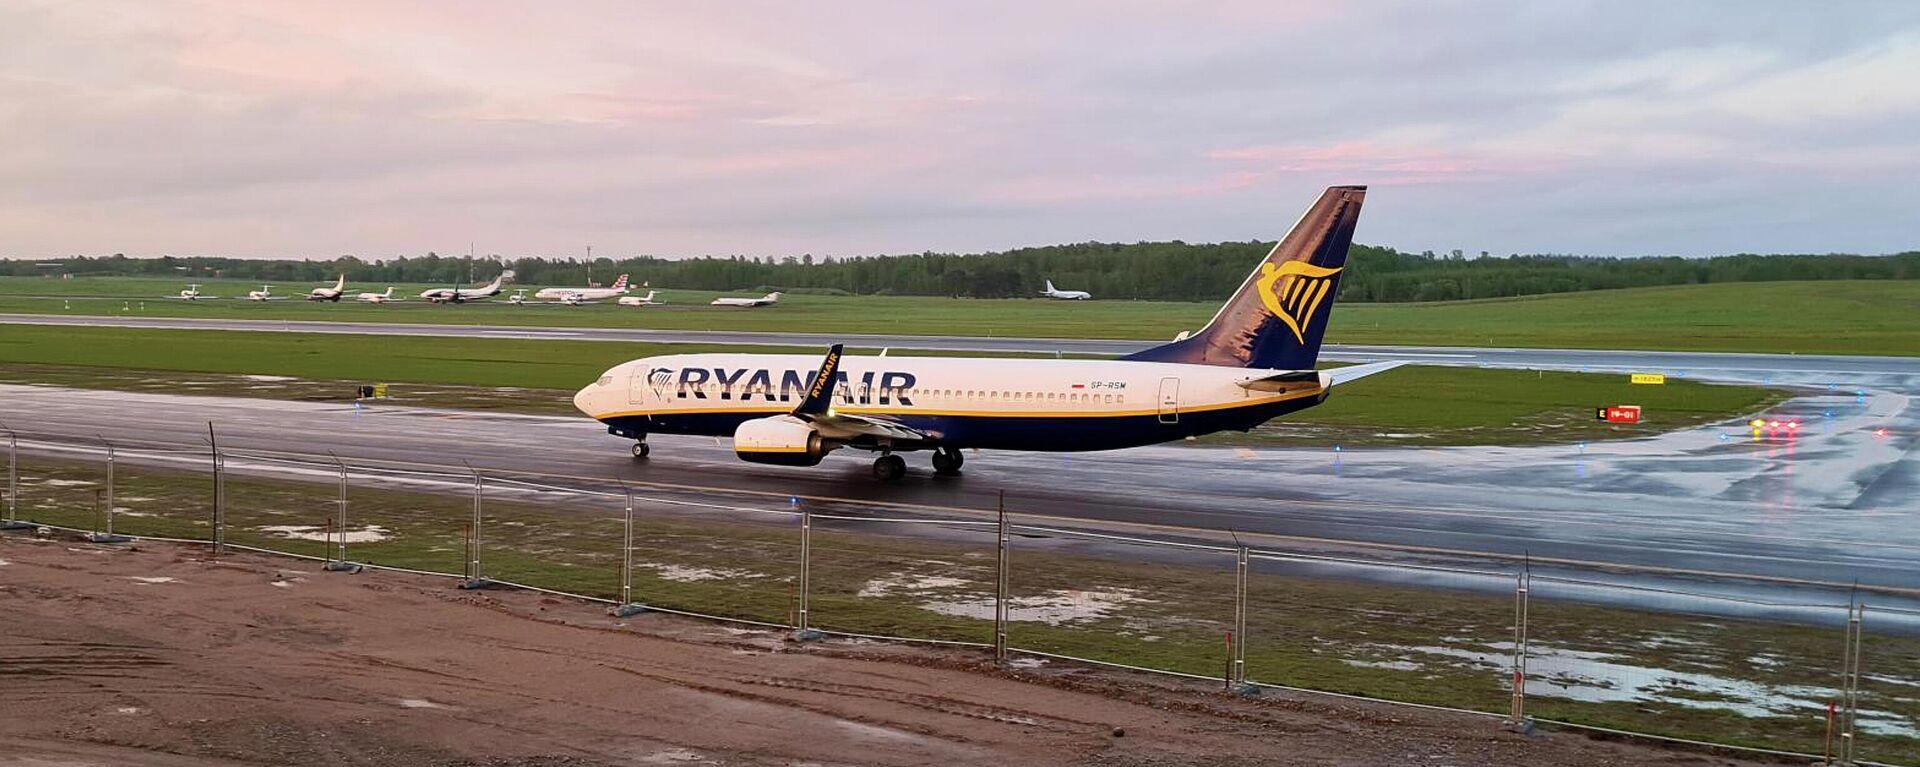 Avión de Ryanair - Sputnik Mundo, 1920, 07.06.2021